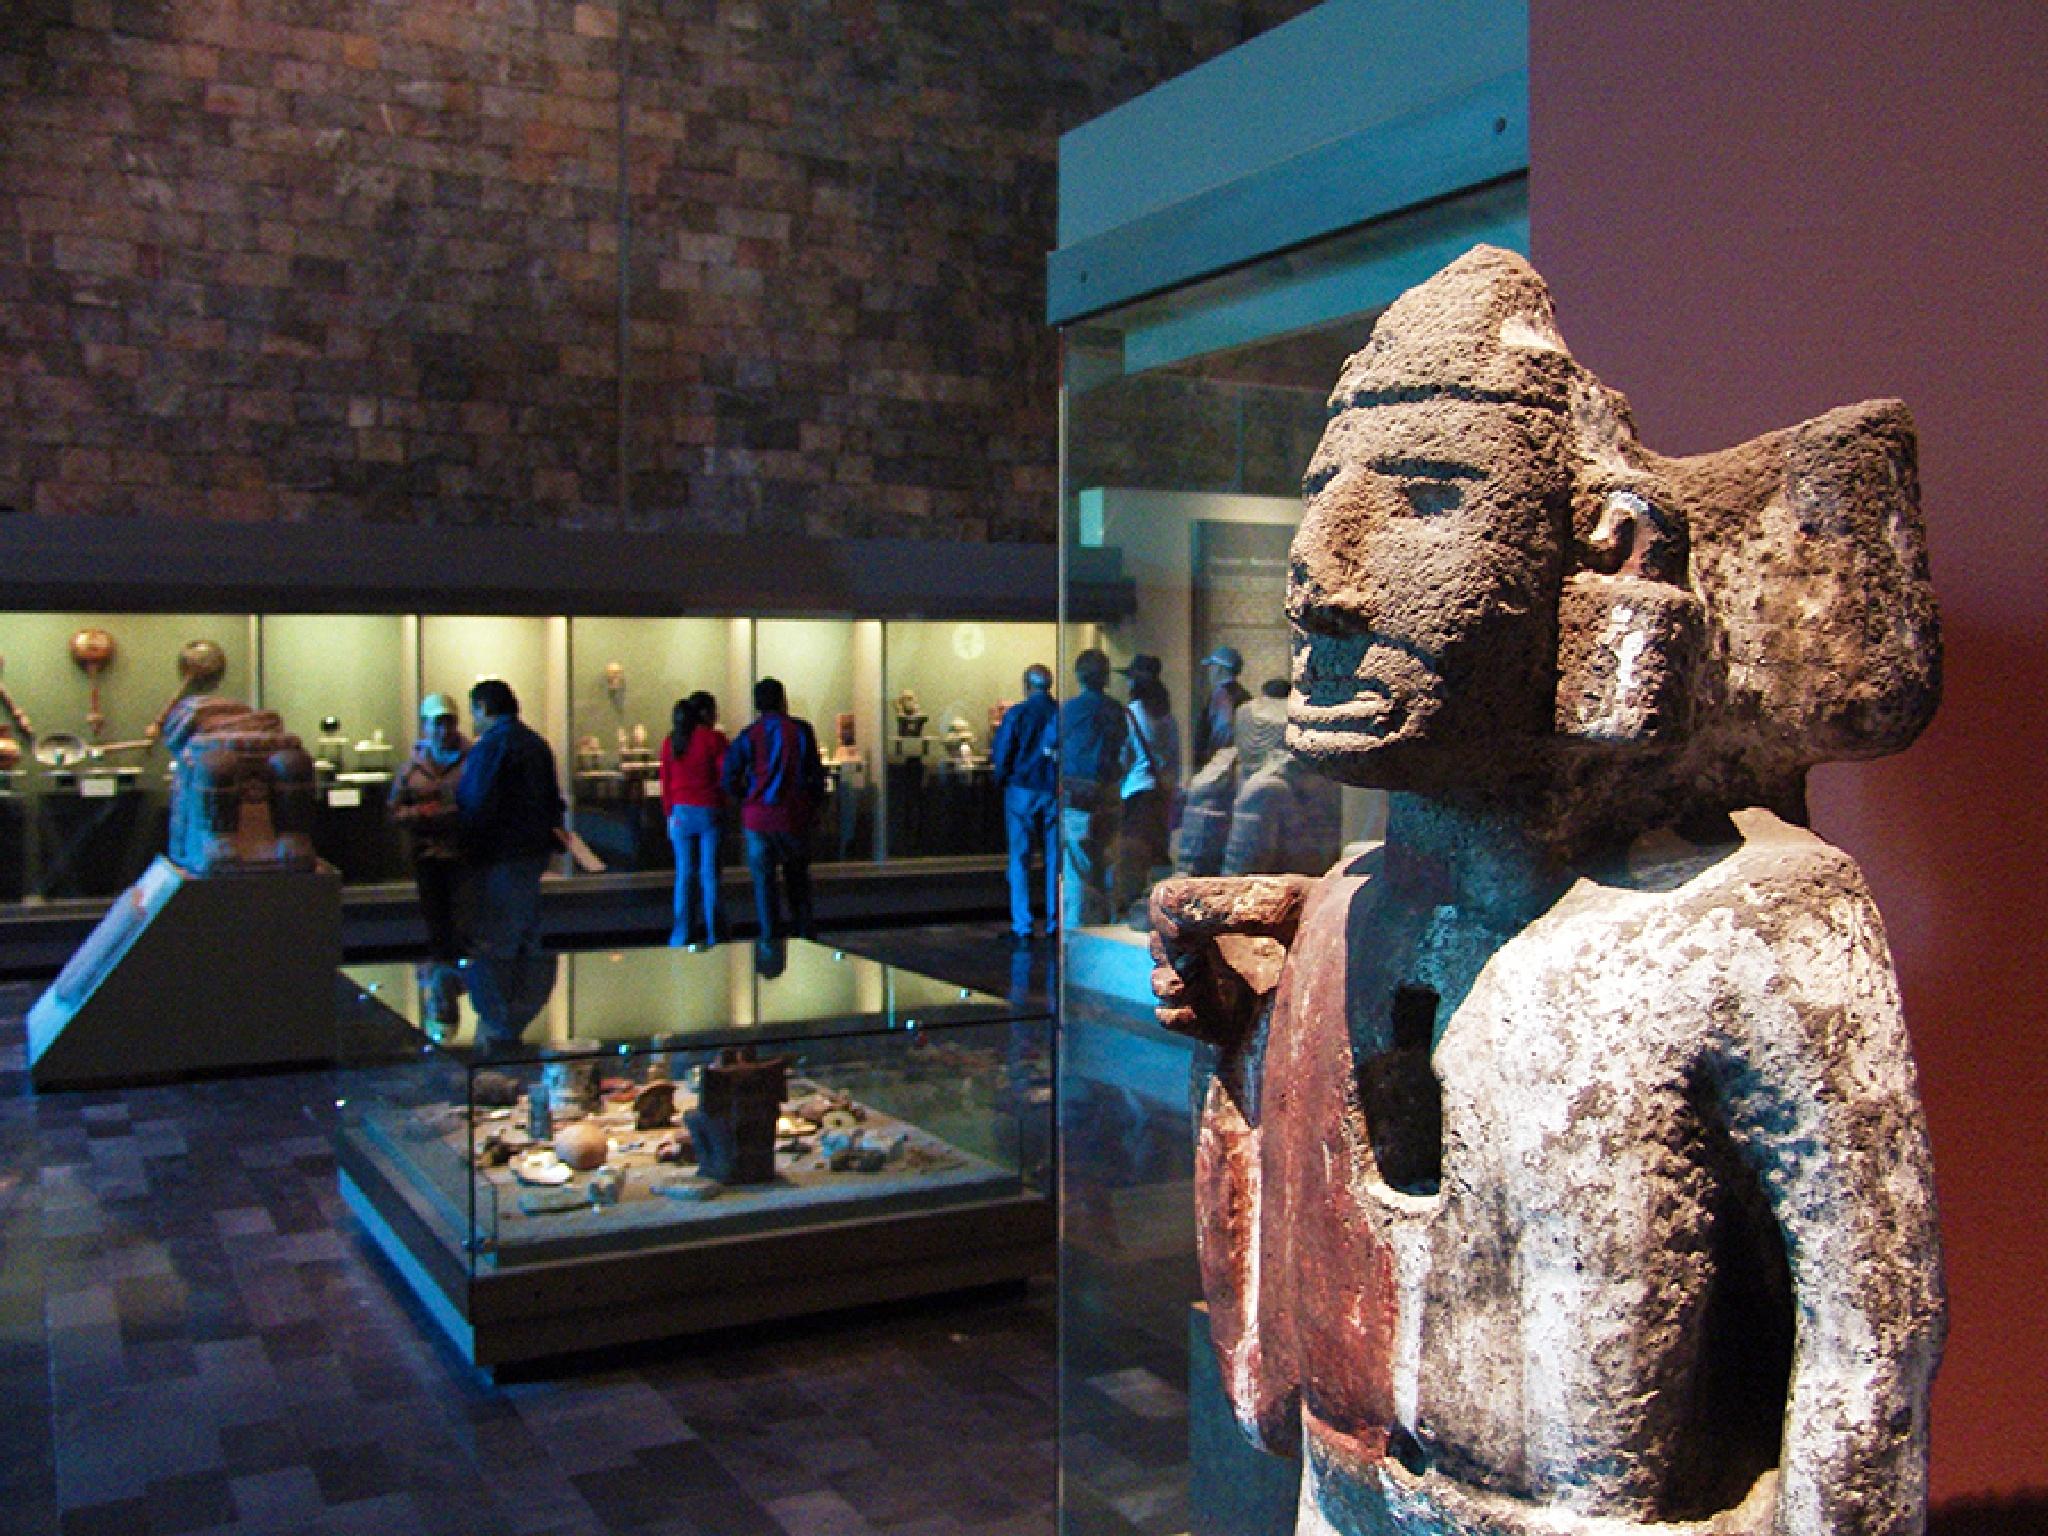 Museu de antropologia da cidade do México. by carlosvasconcelosfot